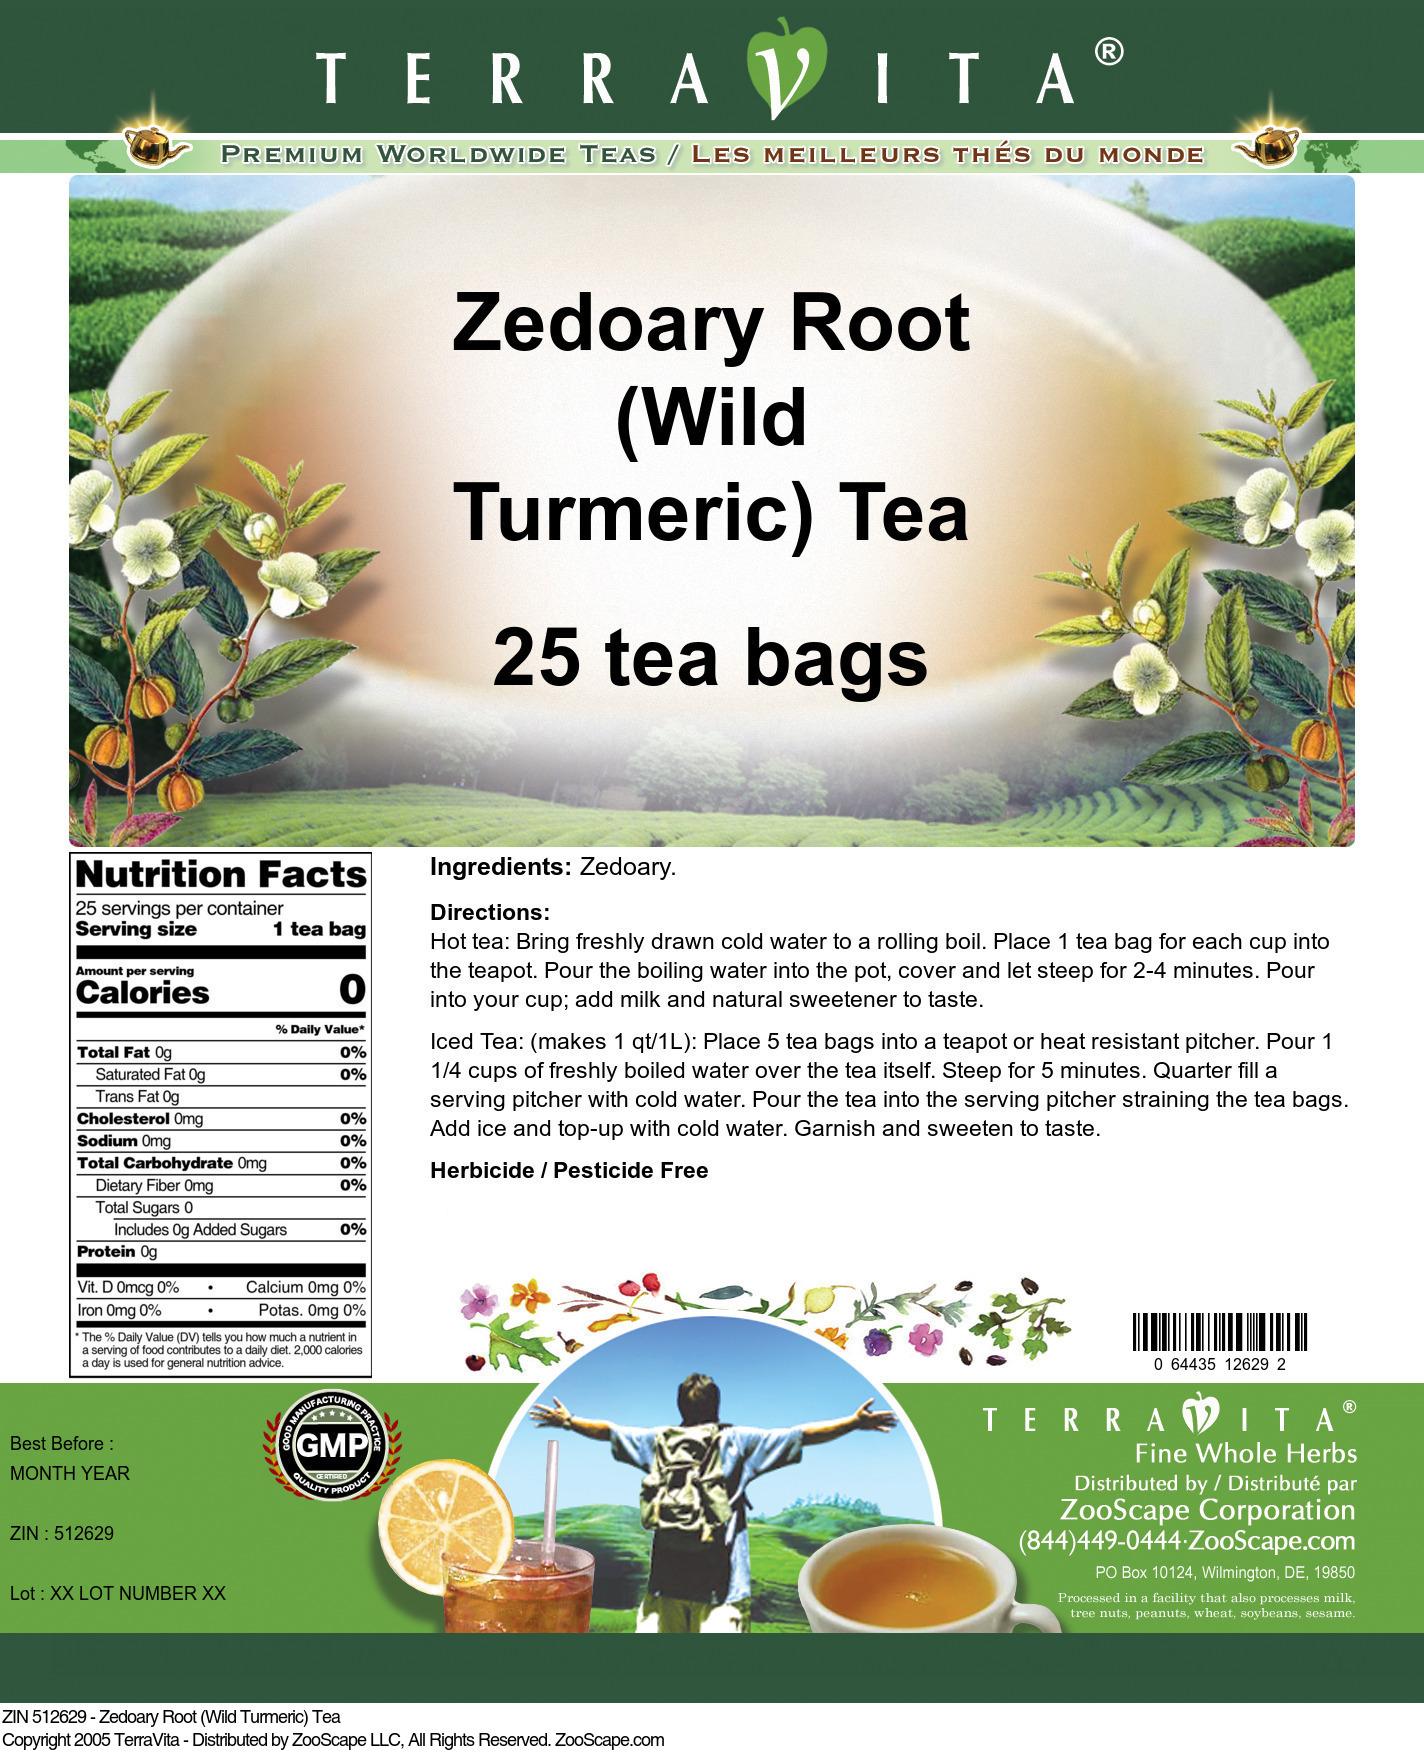 Zedoary Root (Wild Turmeric) Tea